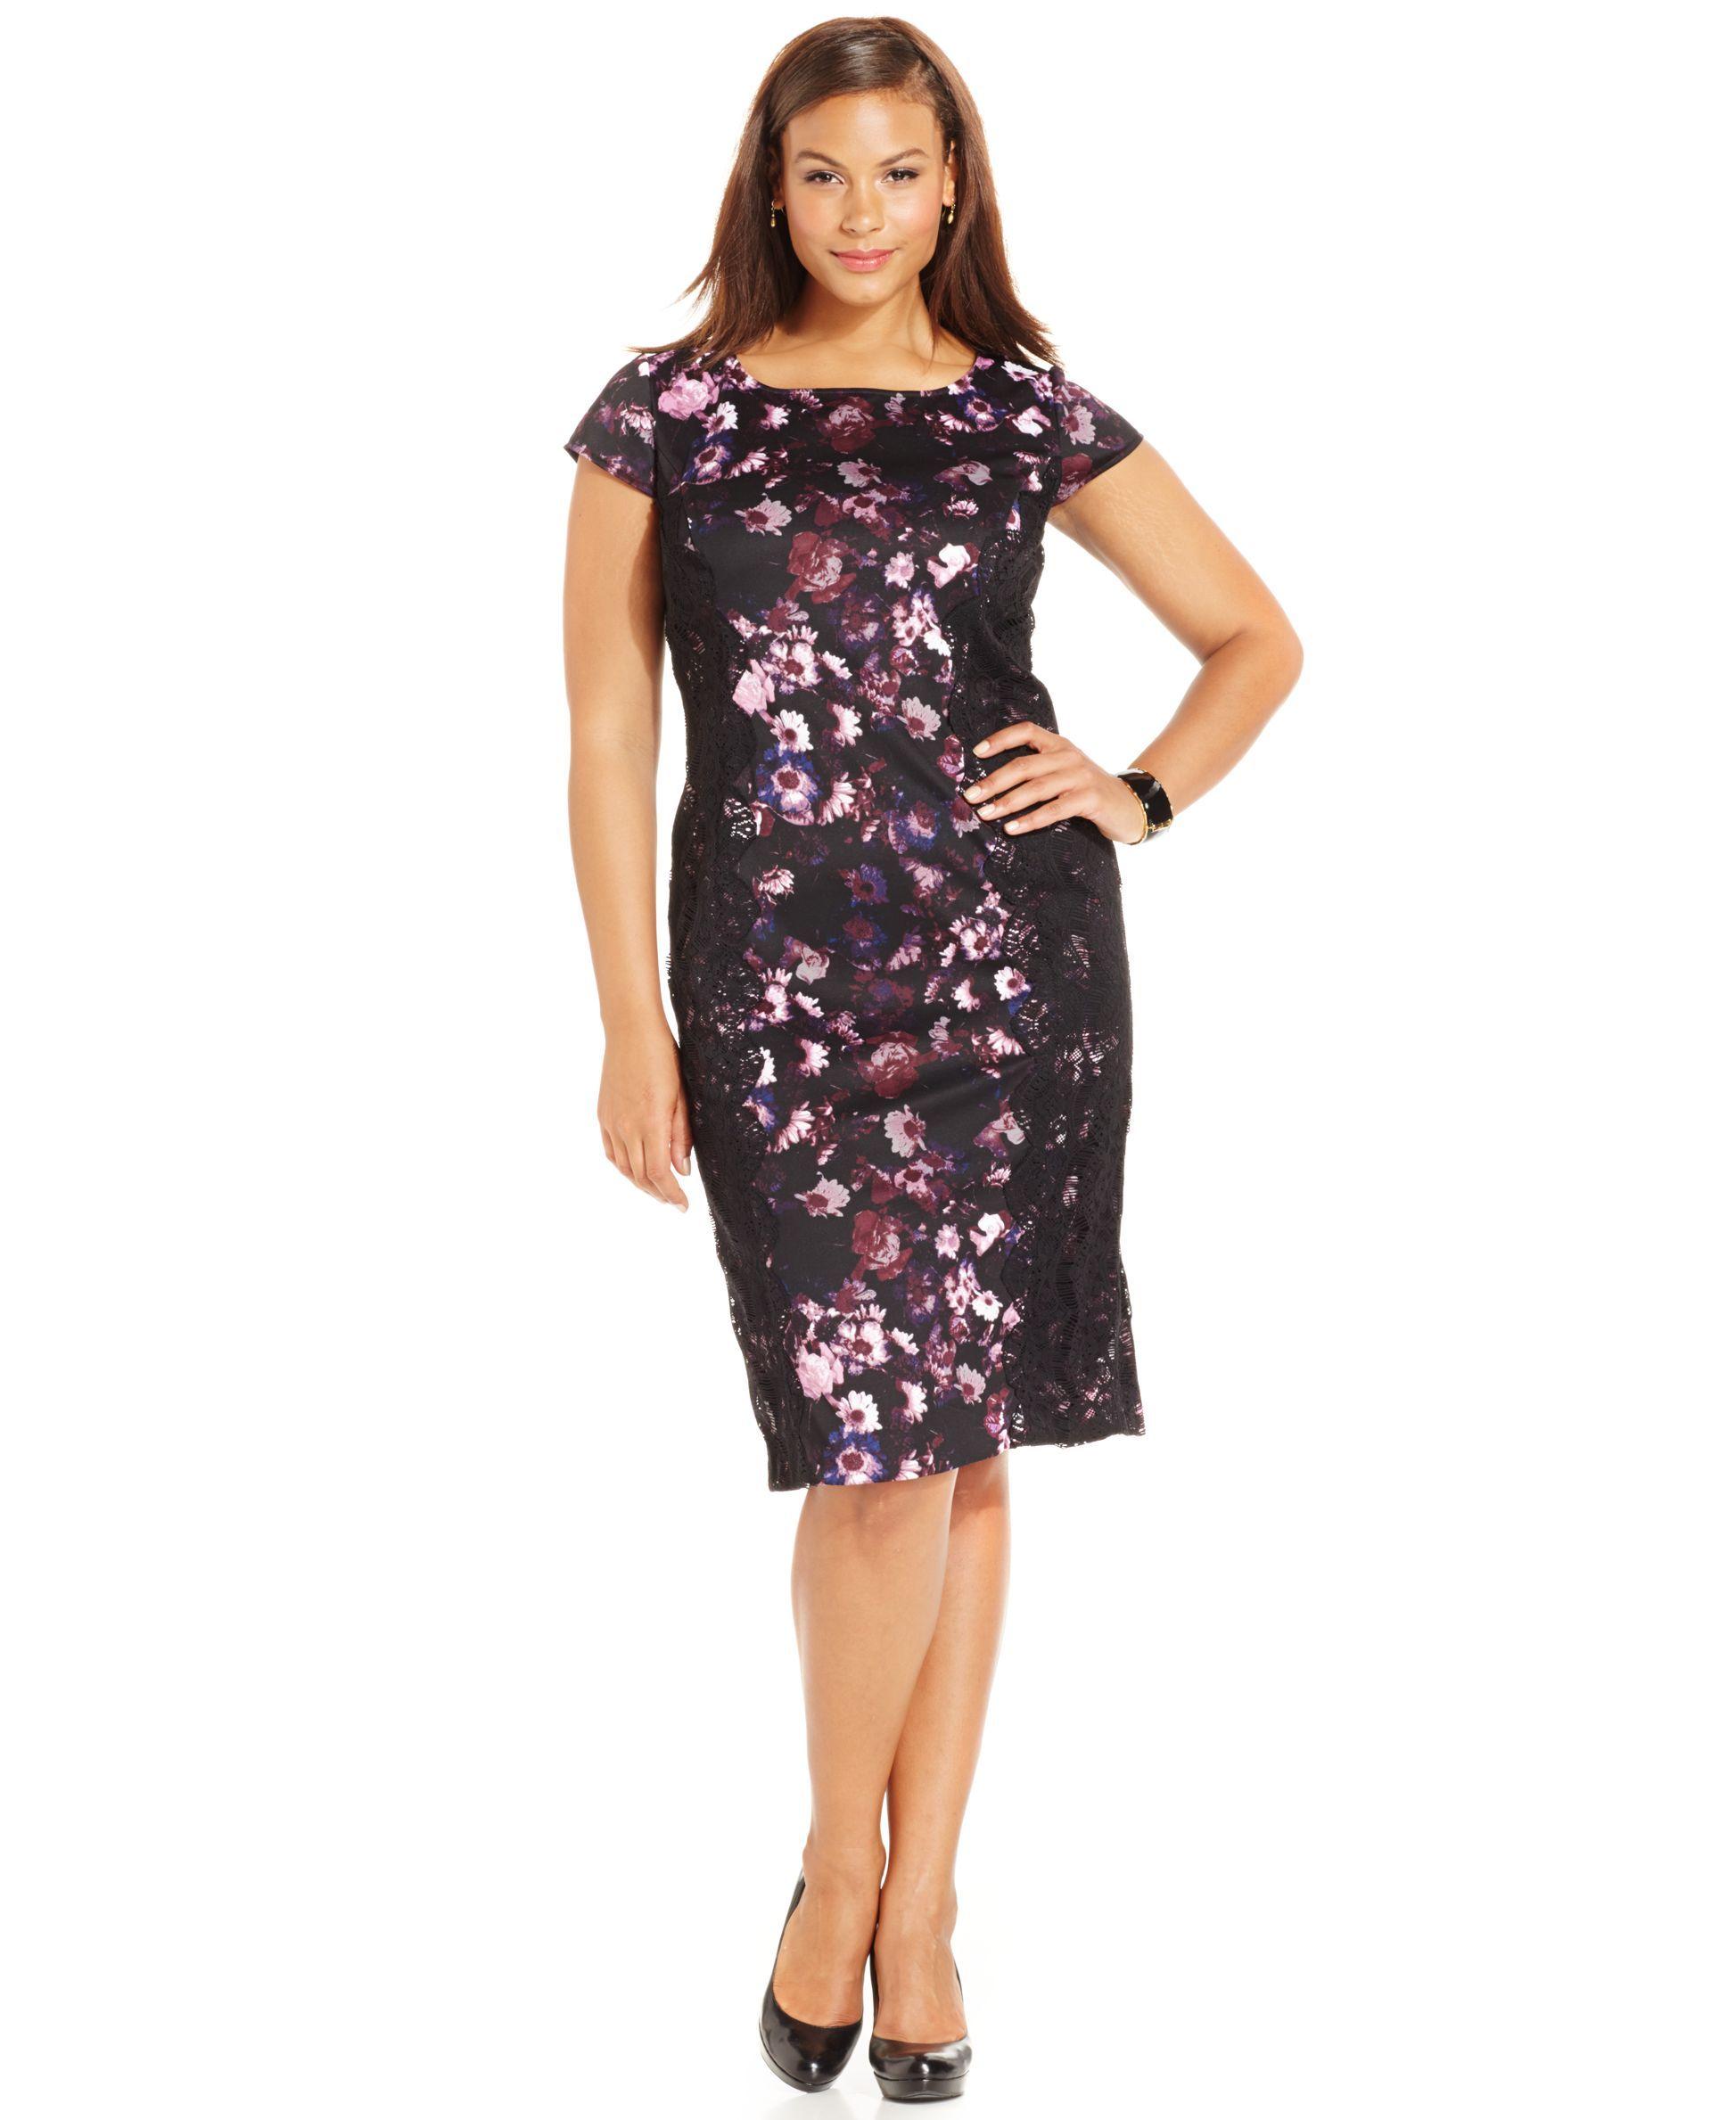 Sl sl fashion dresses - Sl Fashions Plus Size Lace Panel Scuba Dress